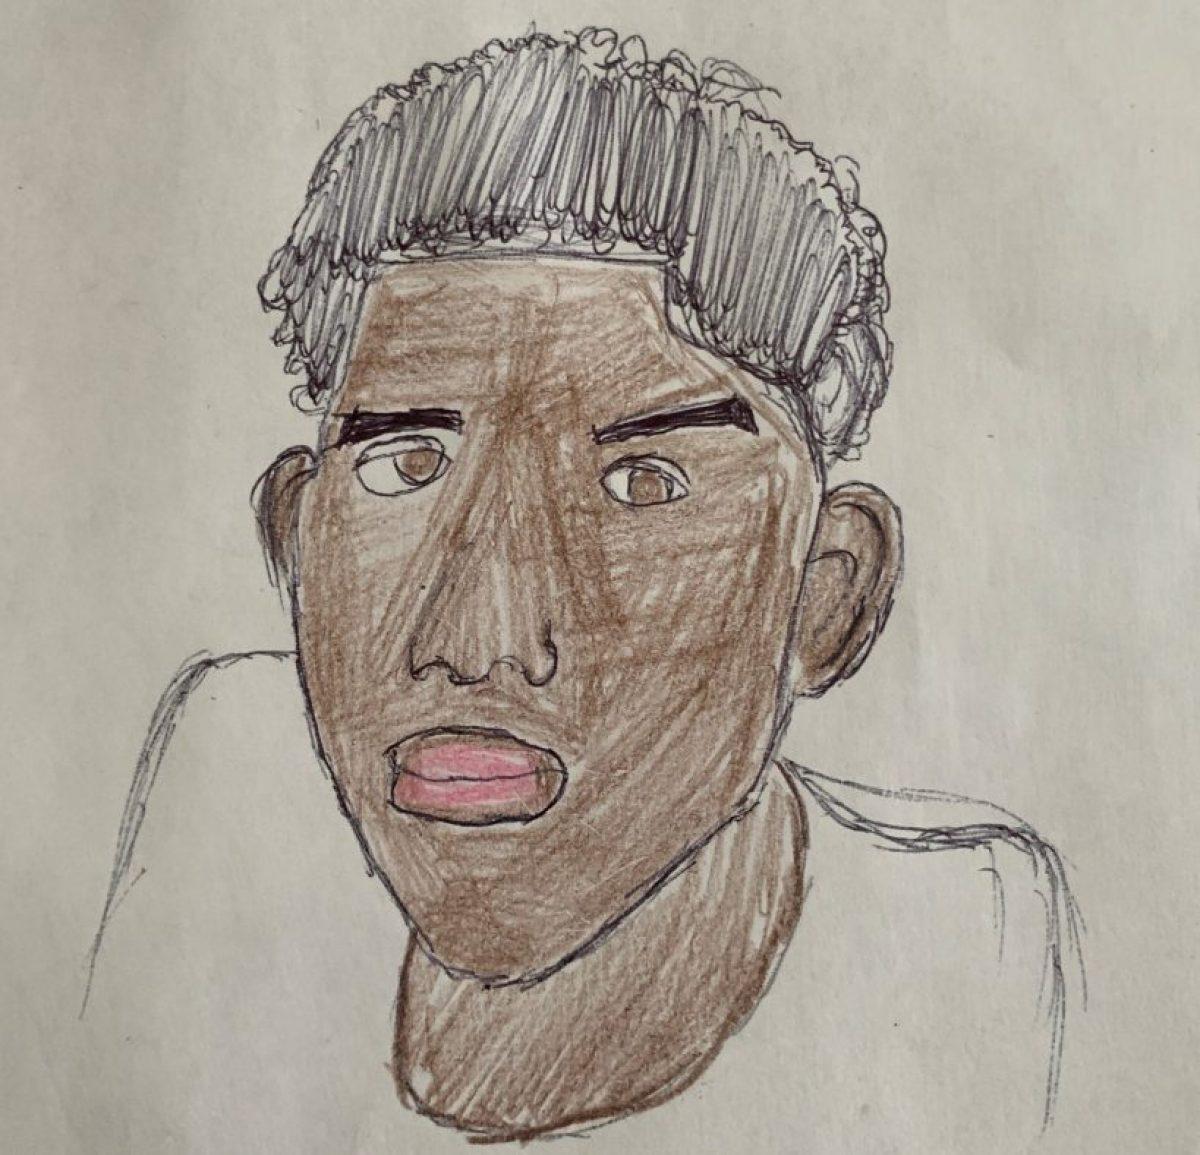 A Vashon High School student self-portrait